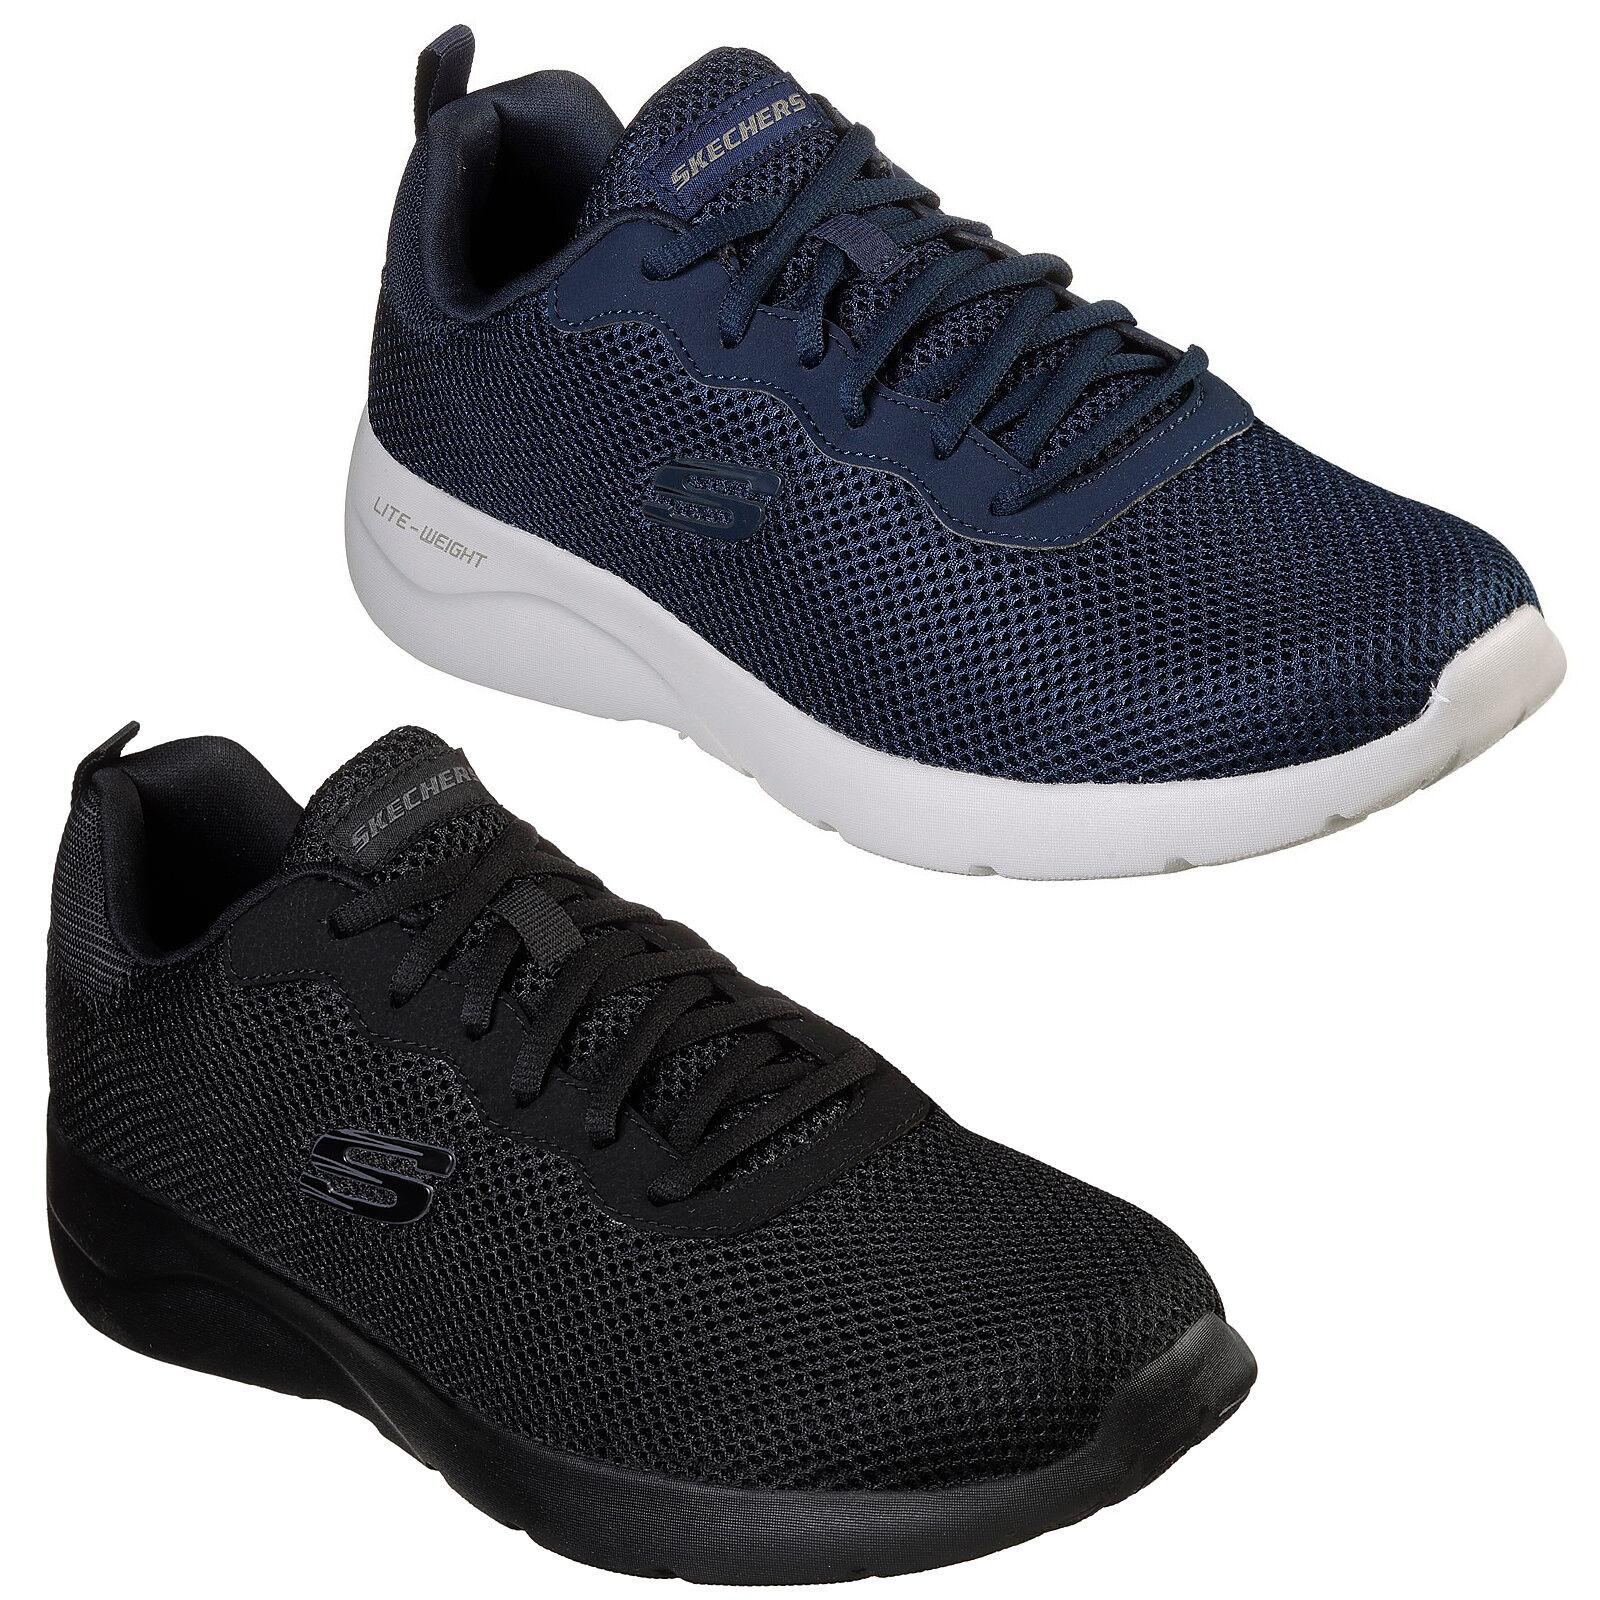 Detalles de Skechers Dynamight 2.0 Rayhill Zapatillas para Hombre Sports Tejido Malla